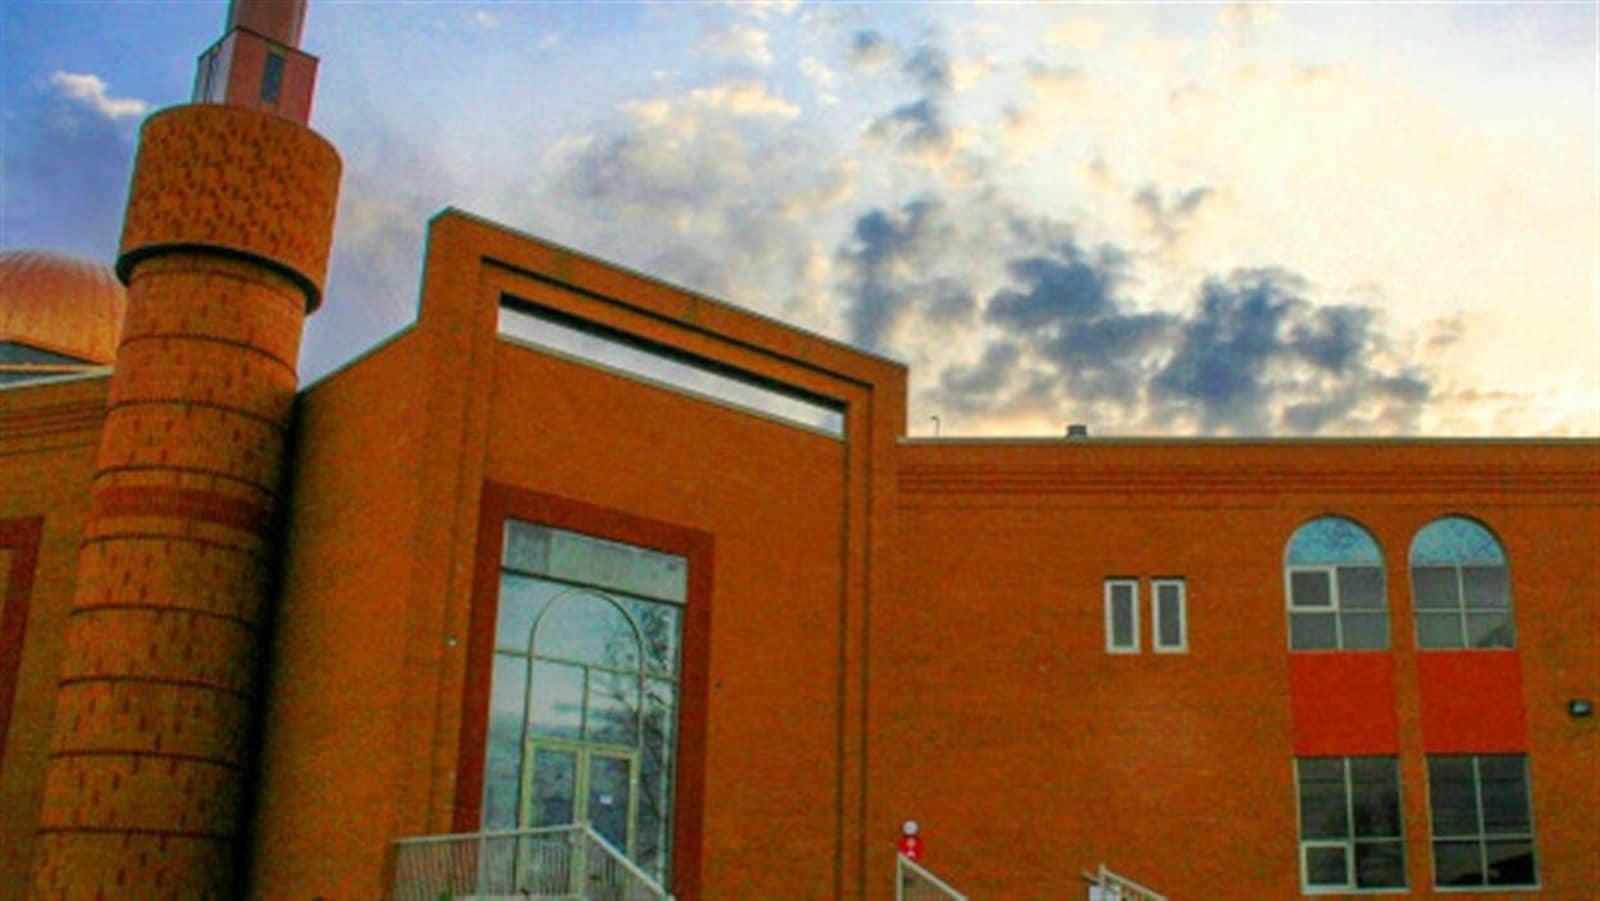 La Mosquée Al-Quba de Brossard, la plus importante du Québec.